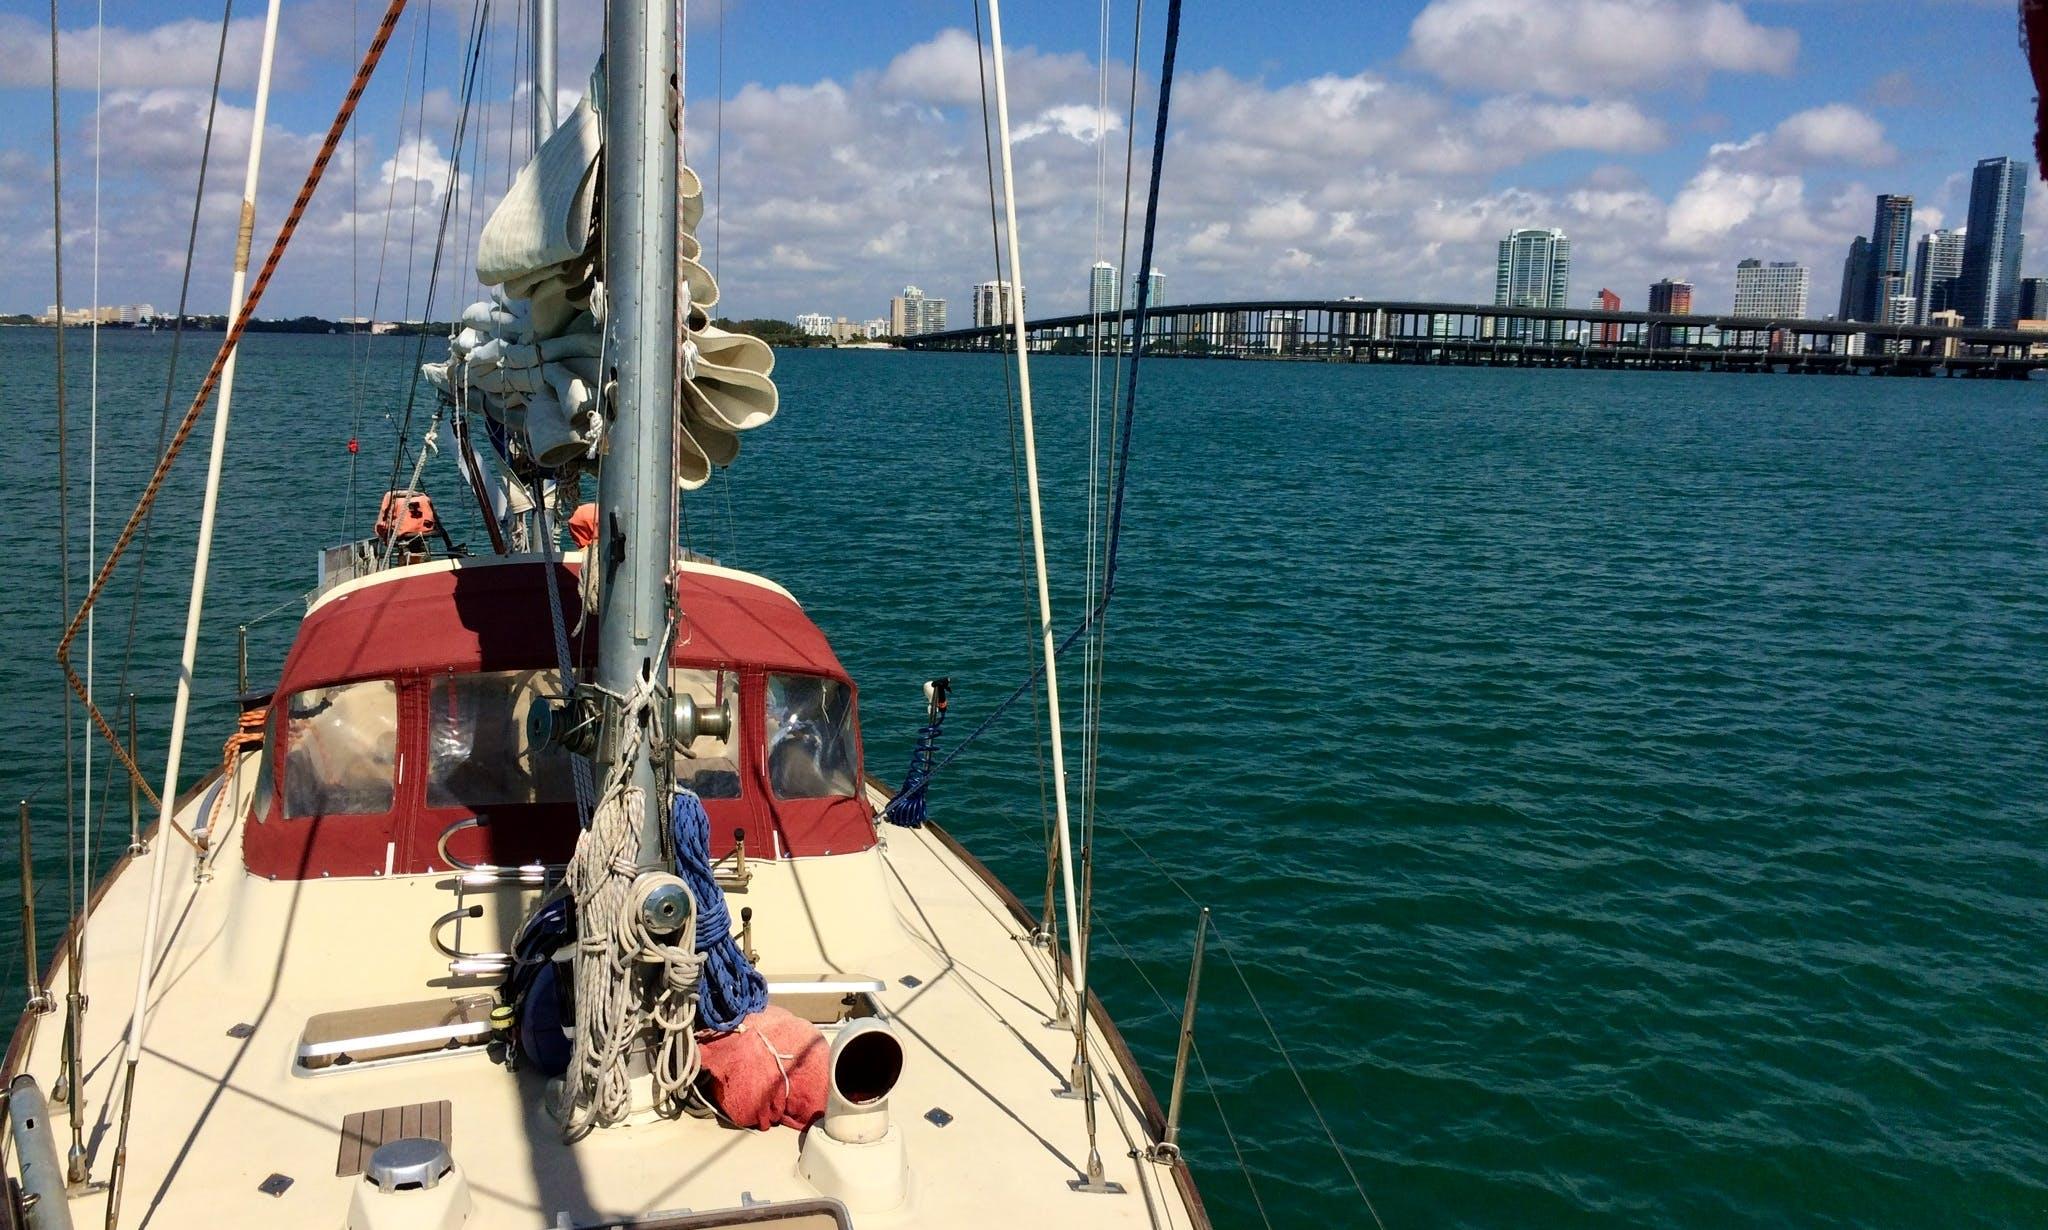 Come Sail Away in the Cruising Monohull rental in Miami!